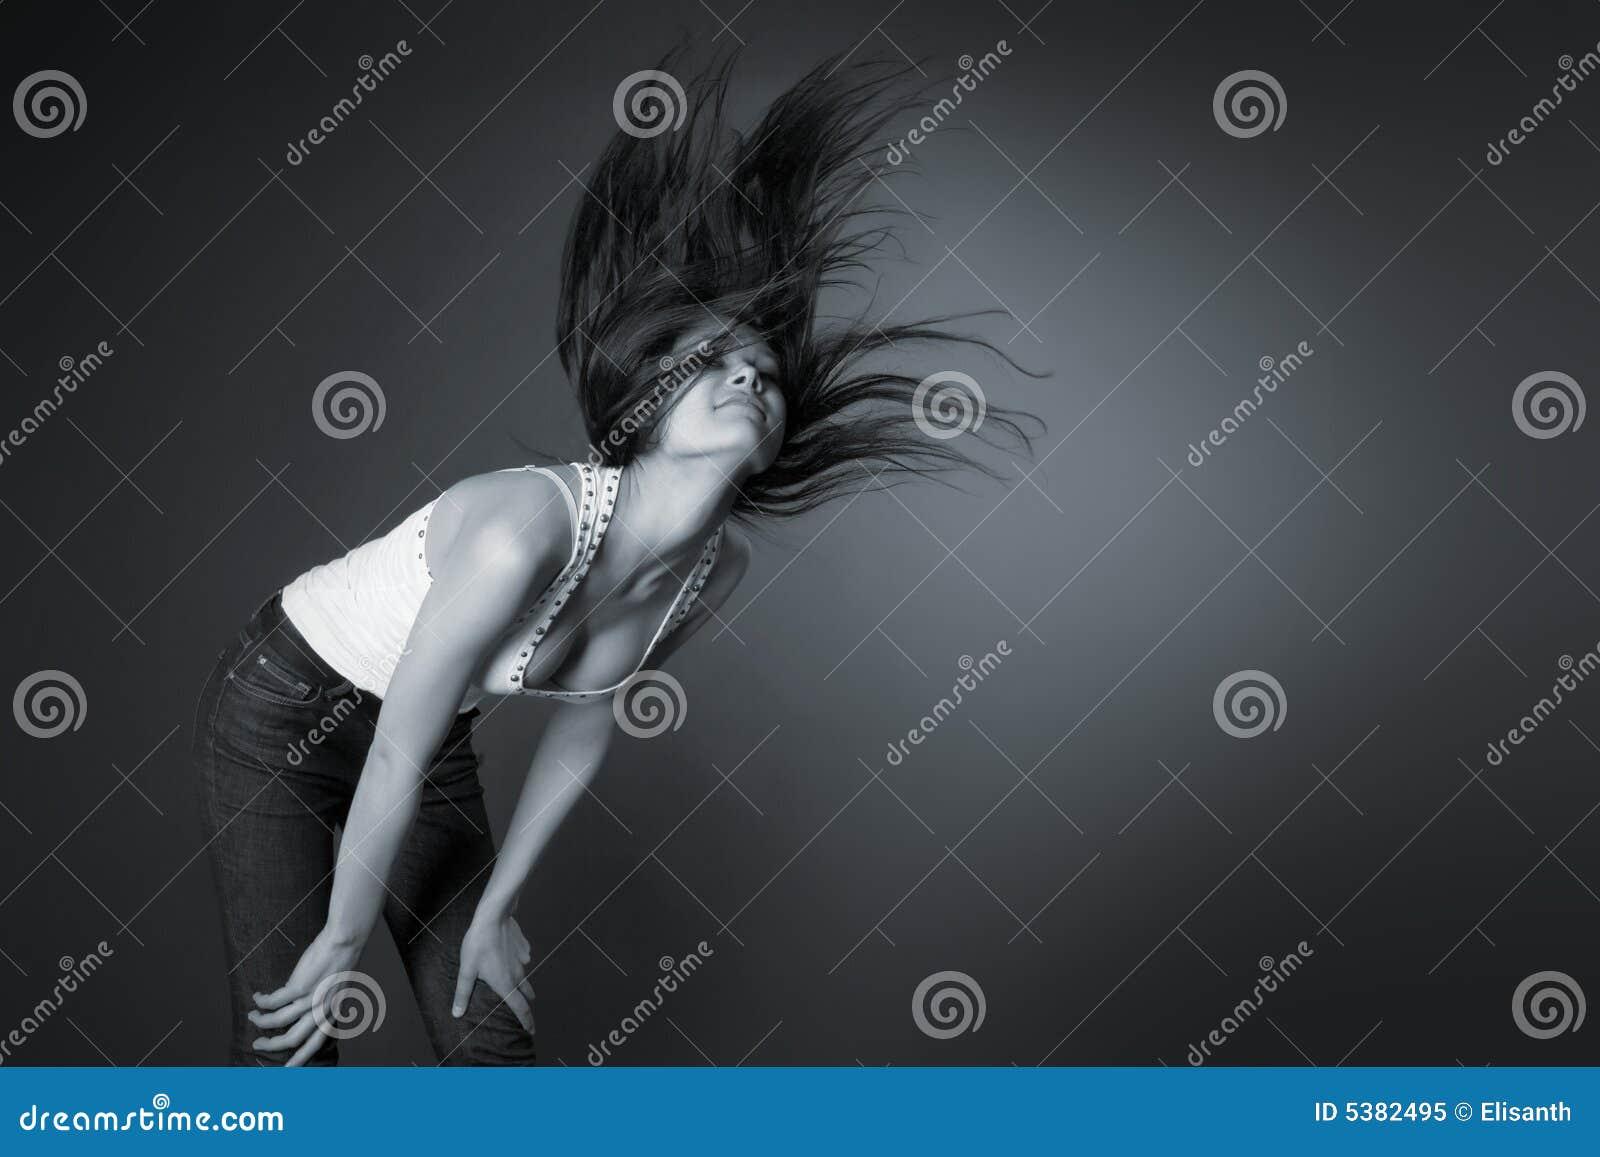 Beautiful girl shaking her head, monochrome